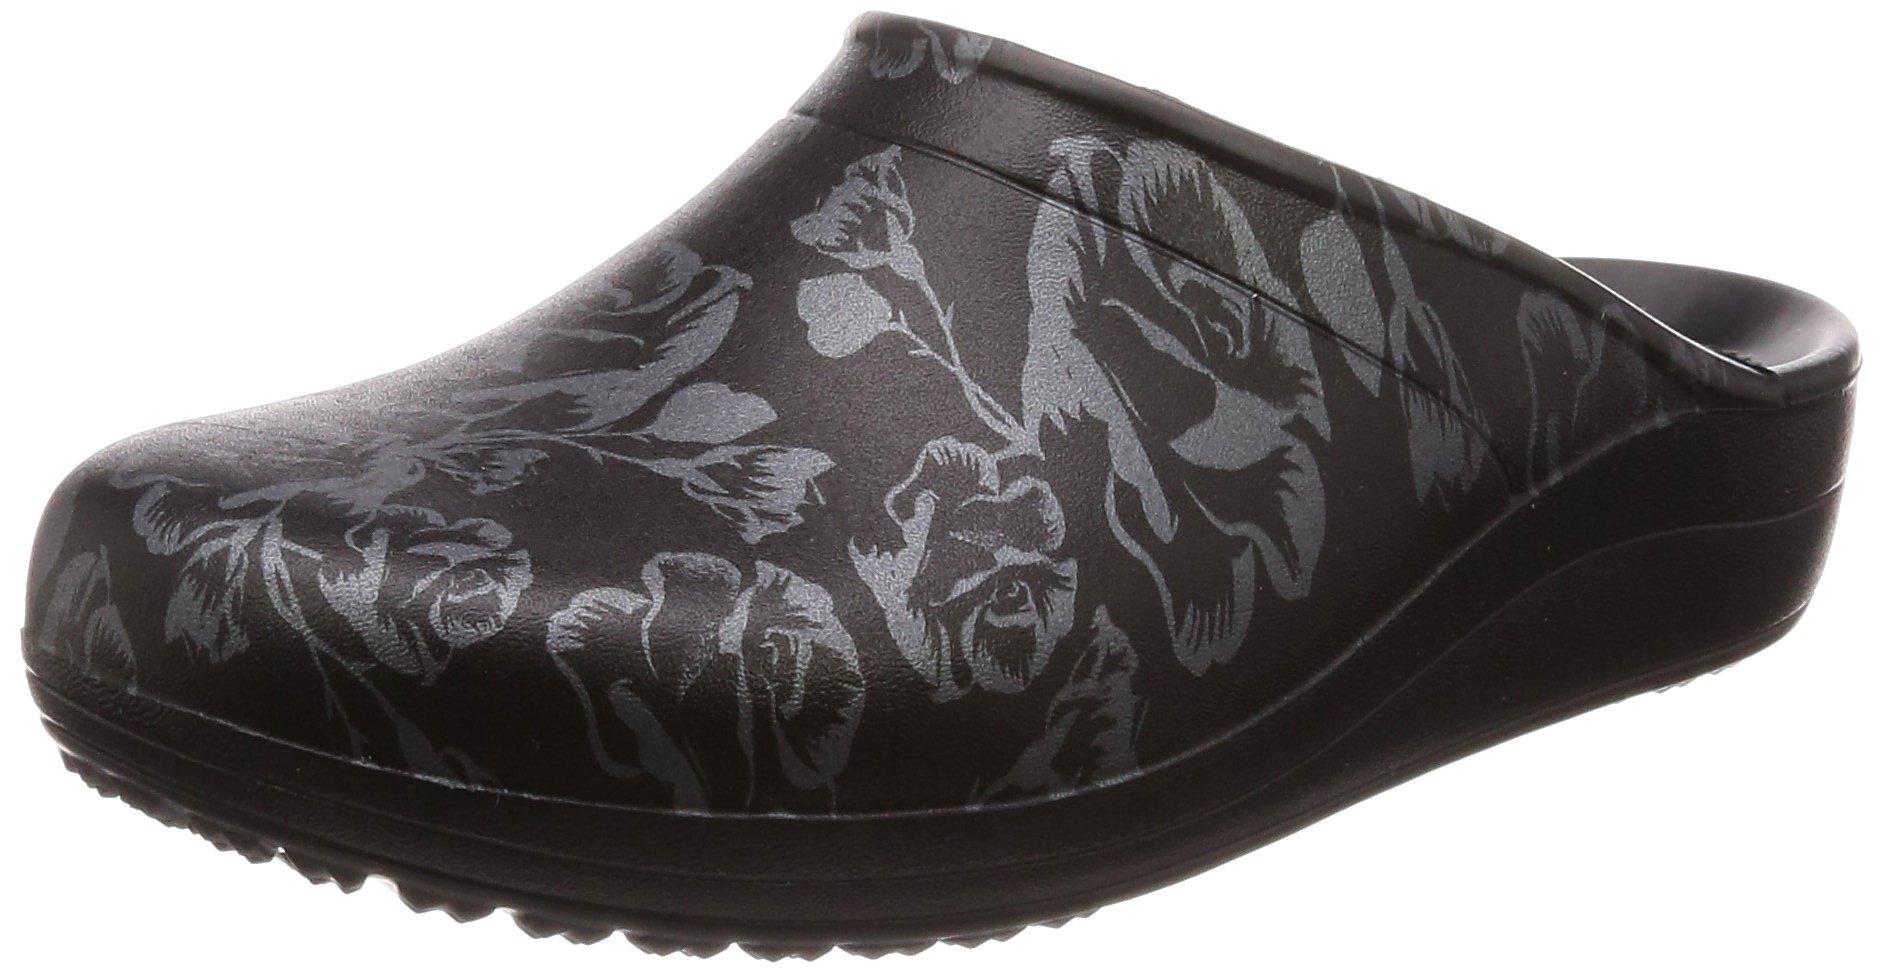 Crocs Women's Sloane Graphic Clog W Shoe, Metallic Rose/Black, W9 M US